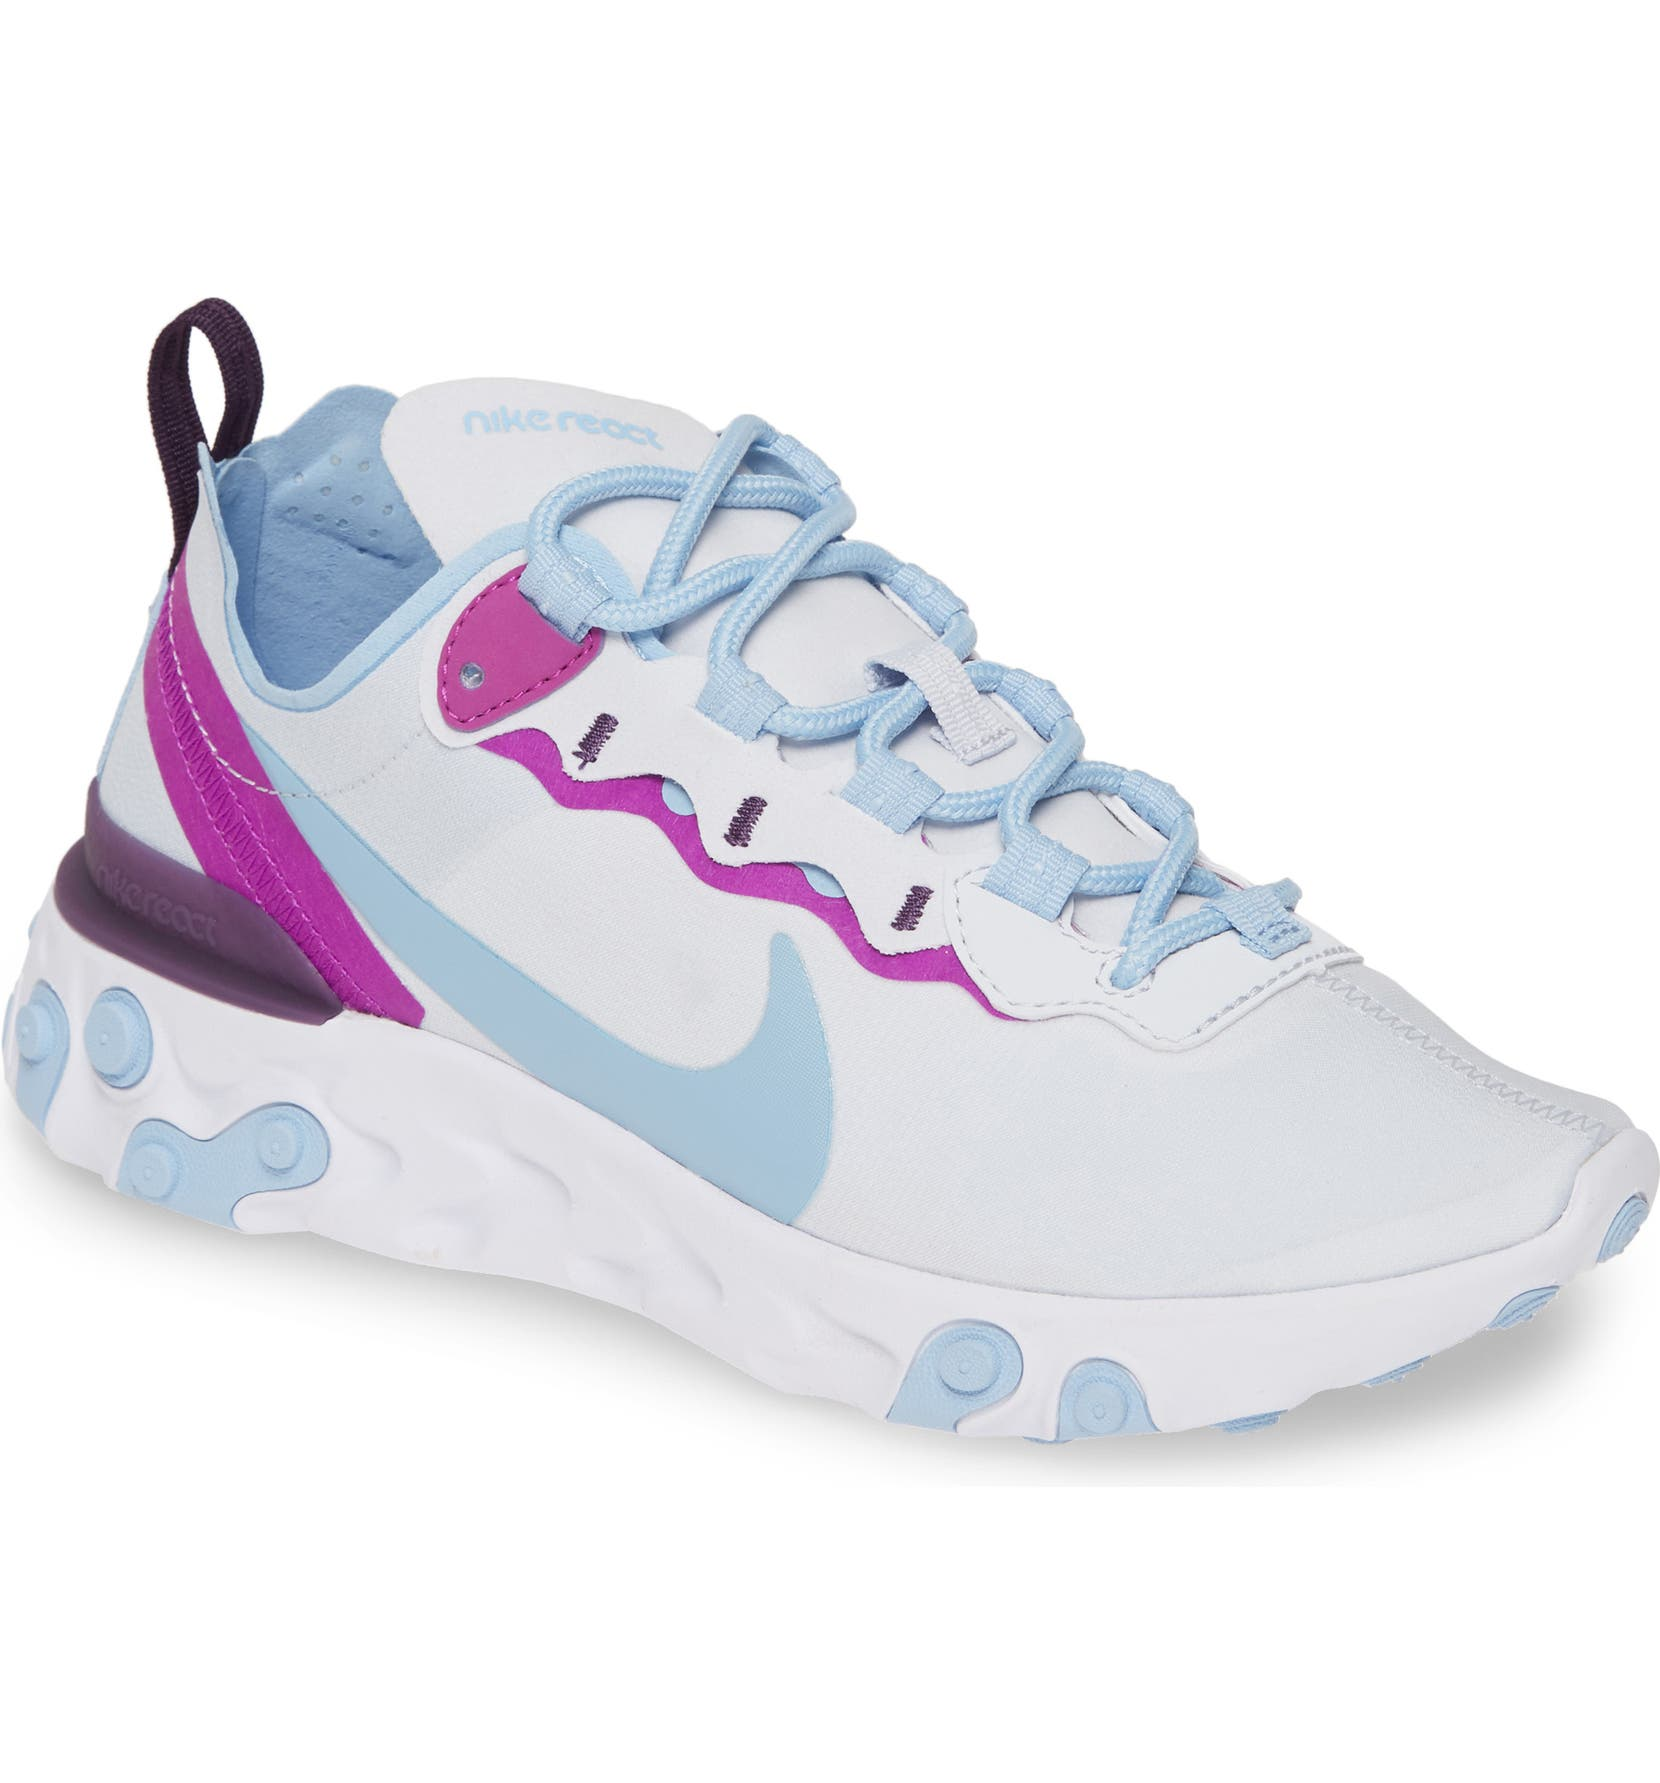 React Element 55 Sneaker